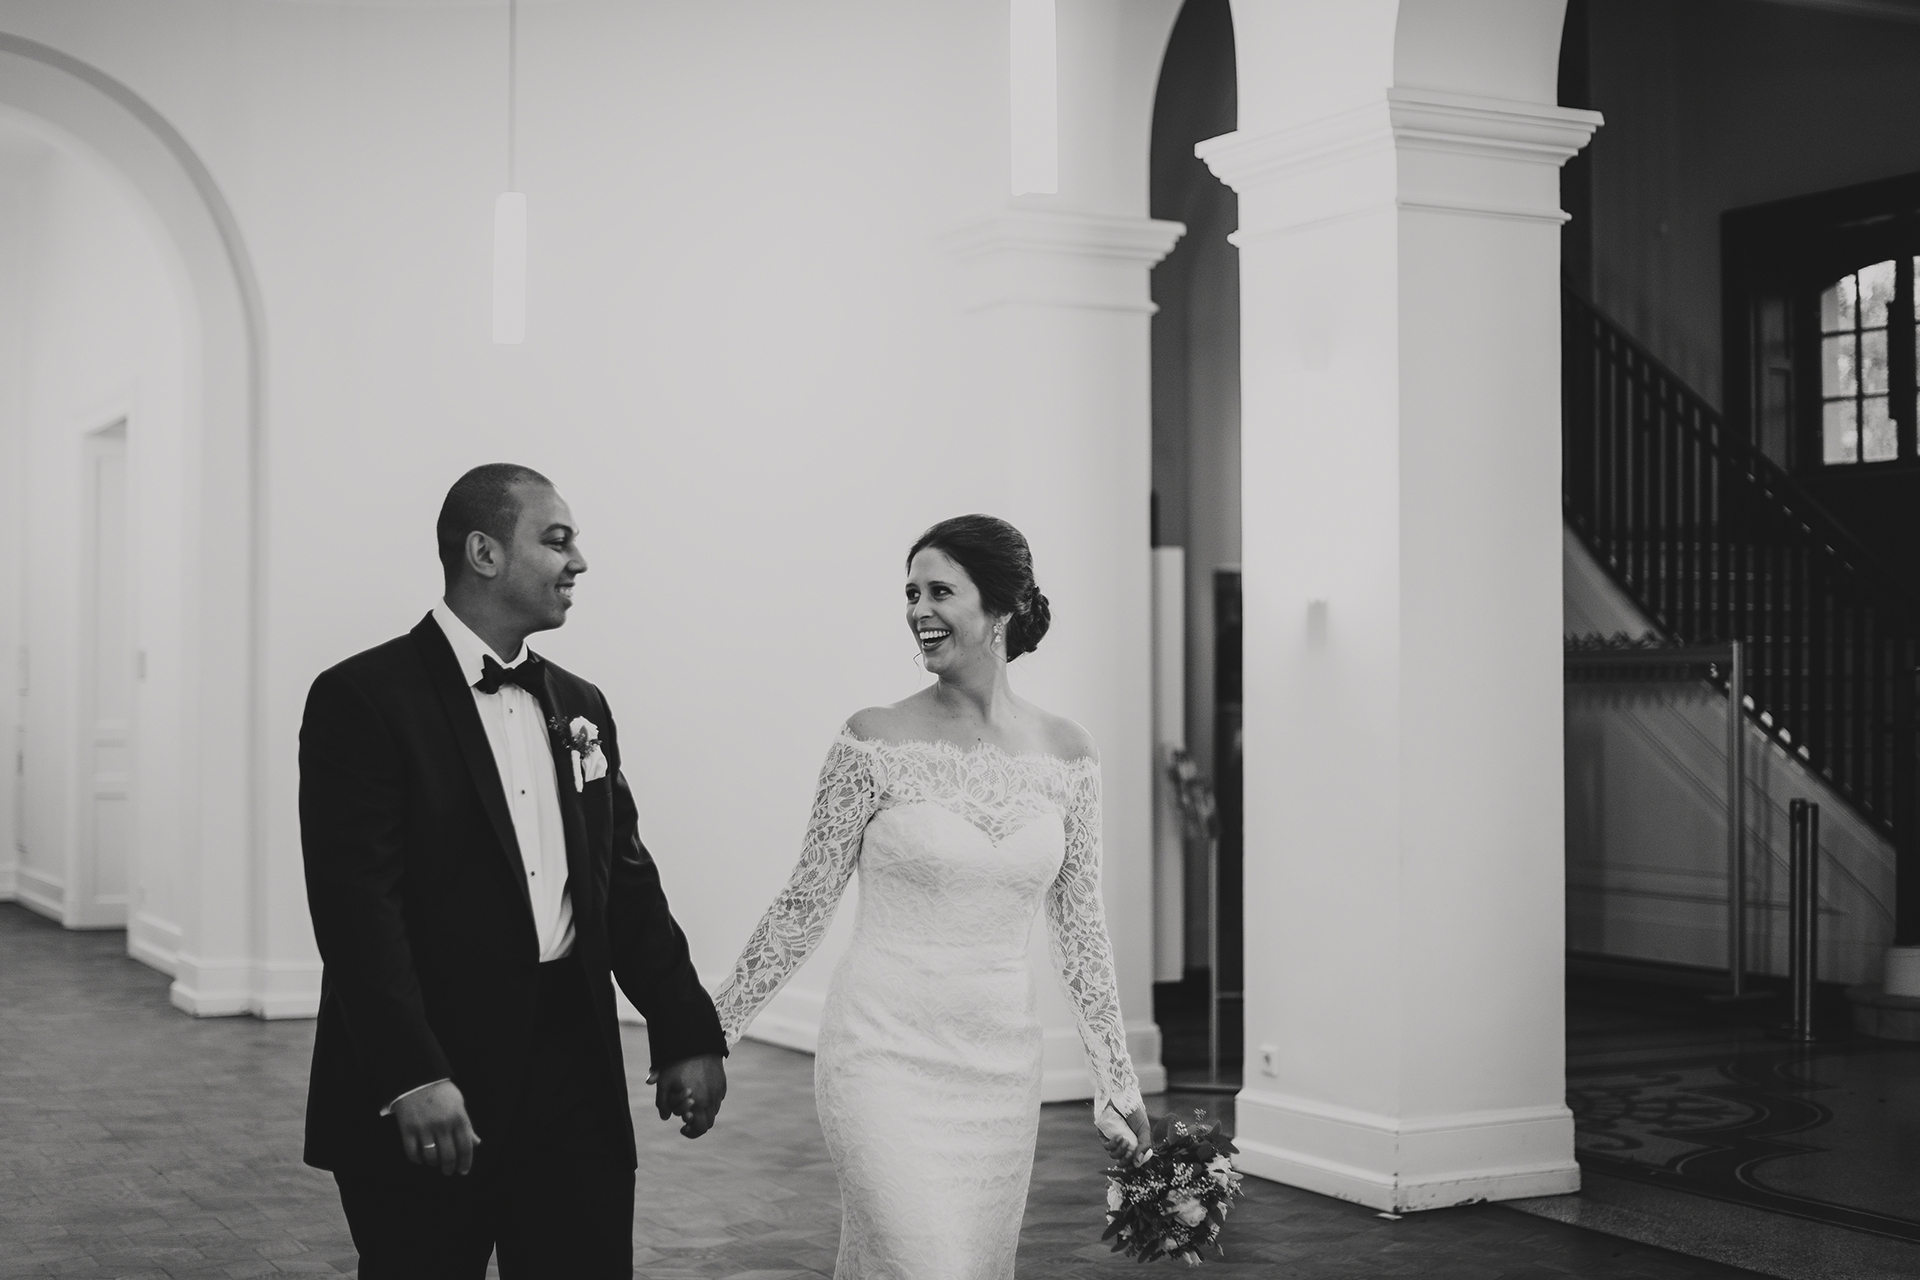 Hochzeitsreportage_J&D_054_Caroline Queda Fotografie